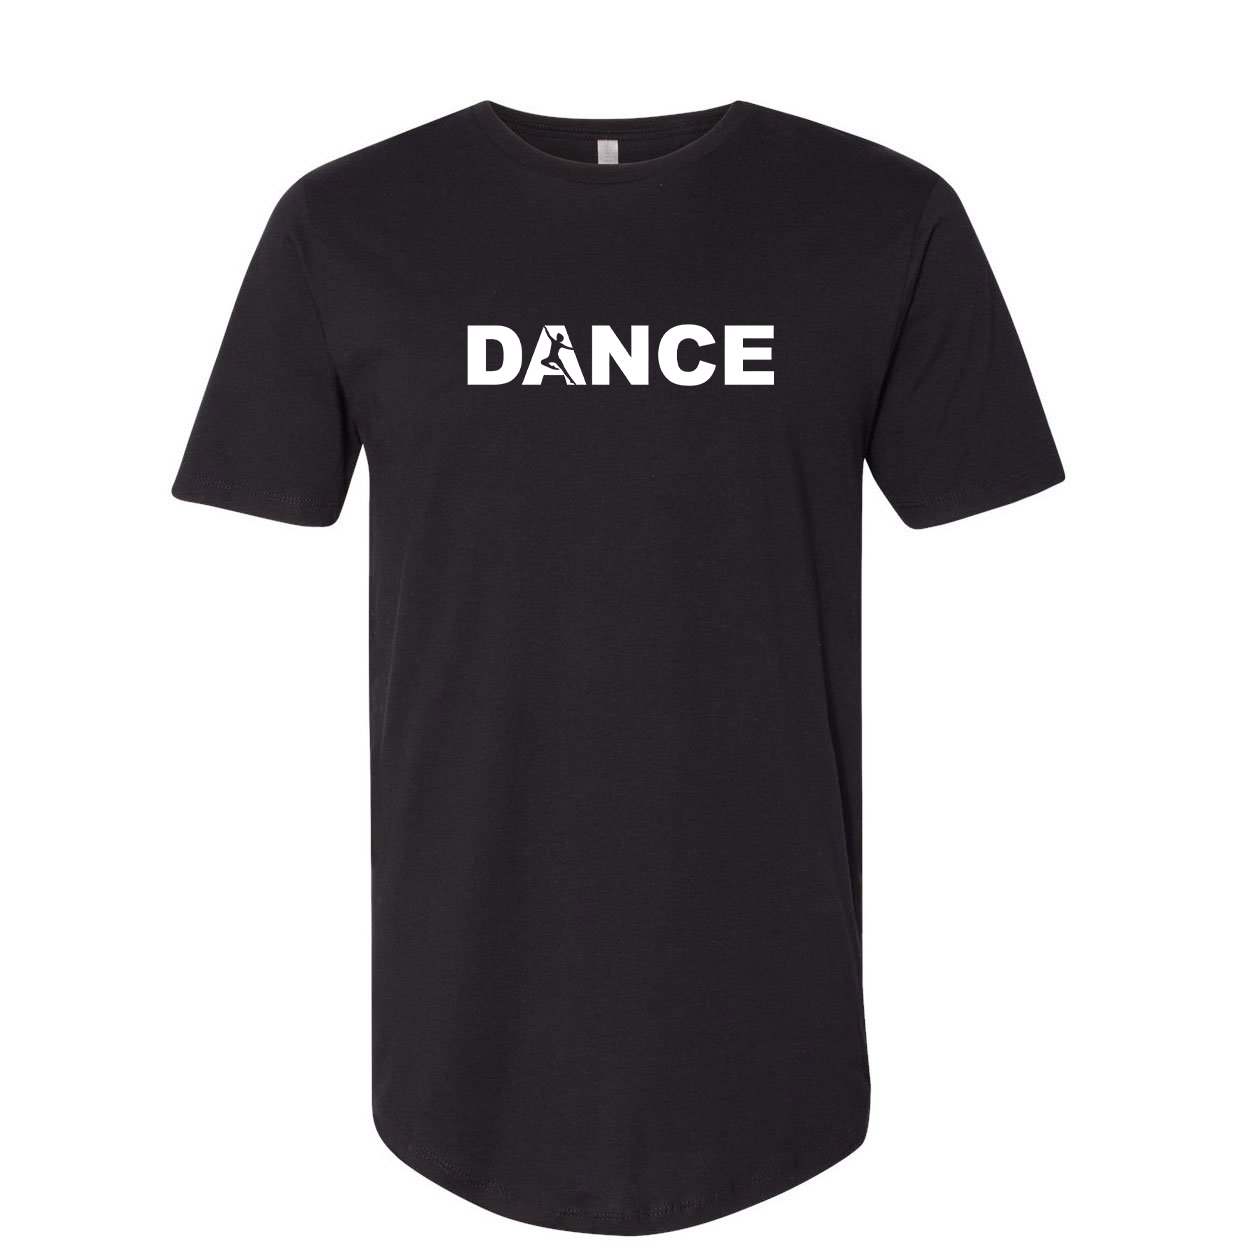 Dance Silhouette Logo Classic Premium Tall T-Shirt Black (White Logo)